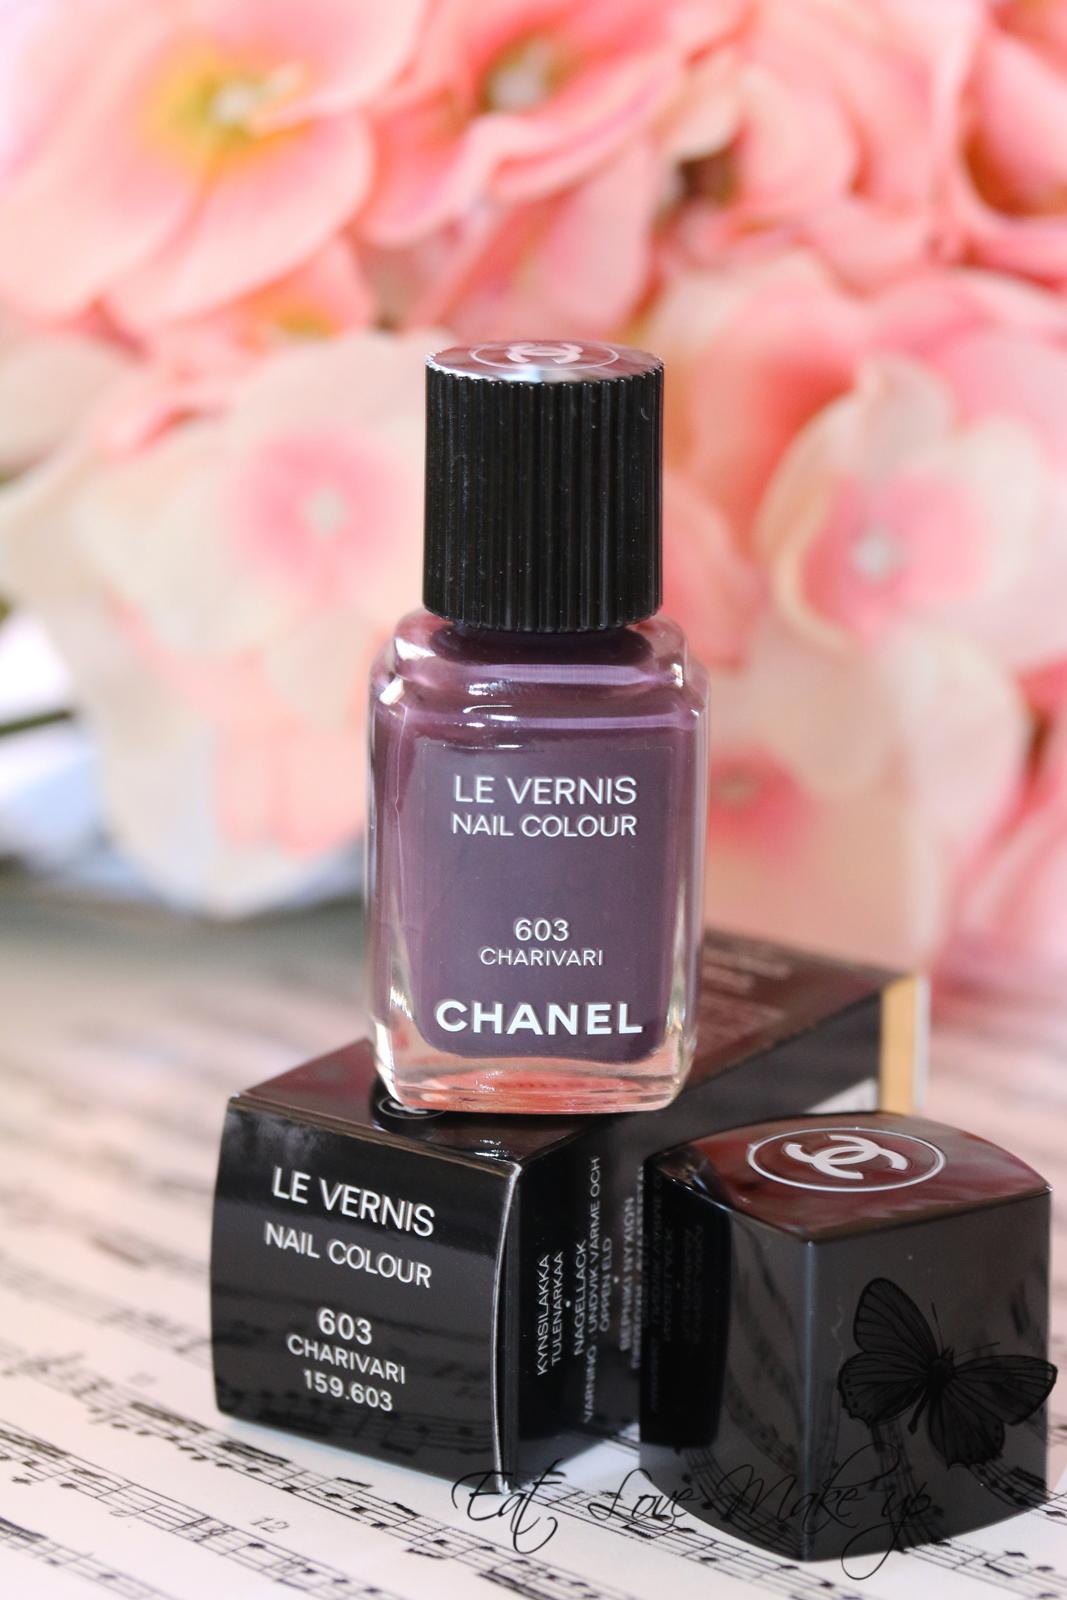 Chanel Le Vernis Nail Colour 603 Charivari